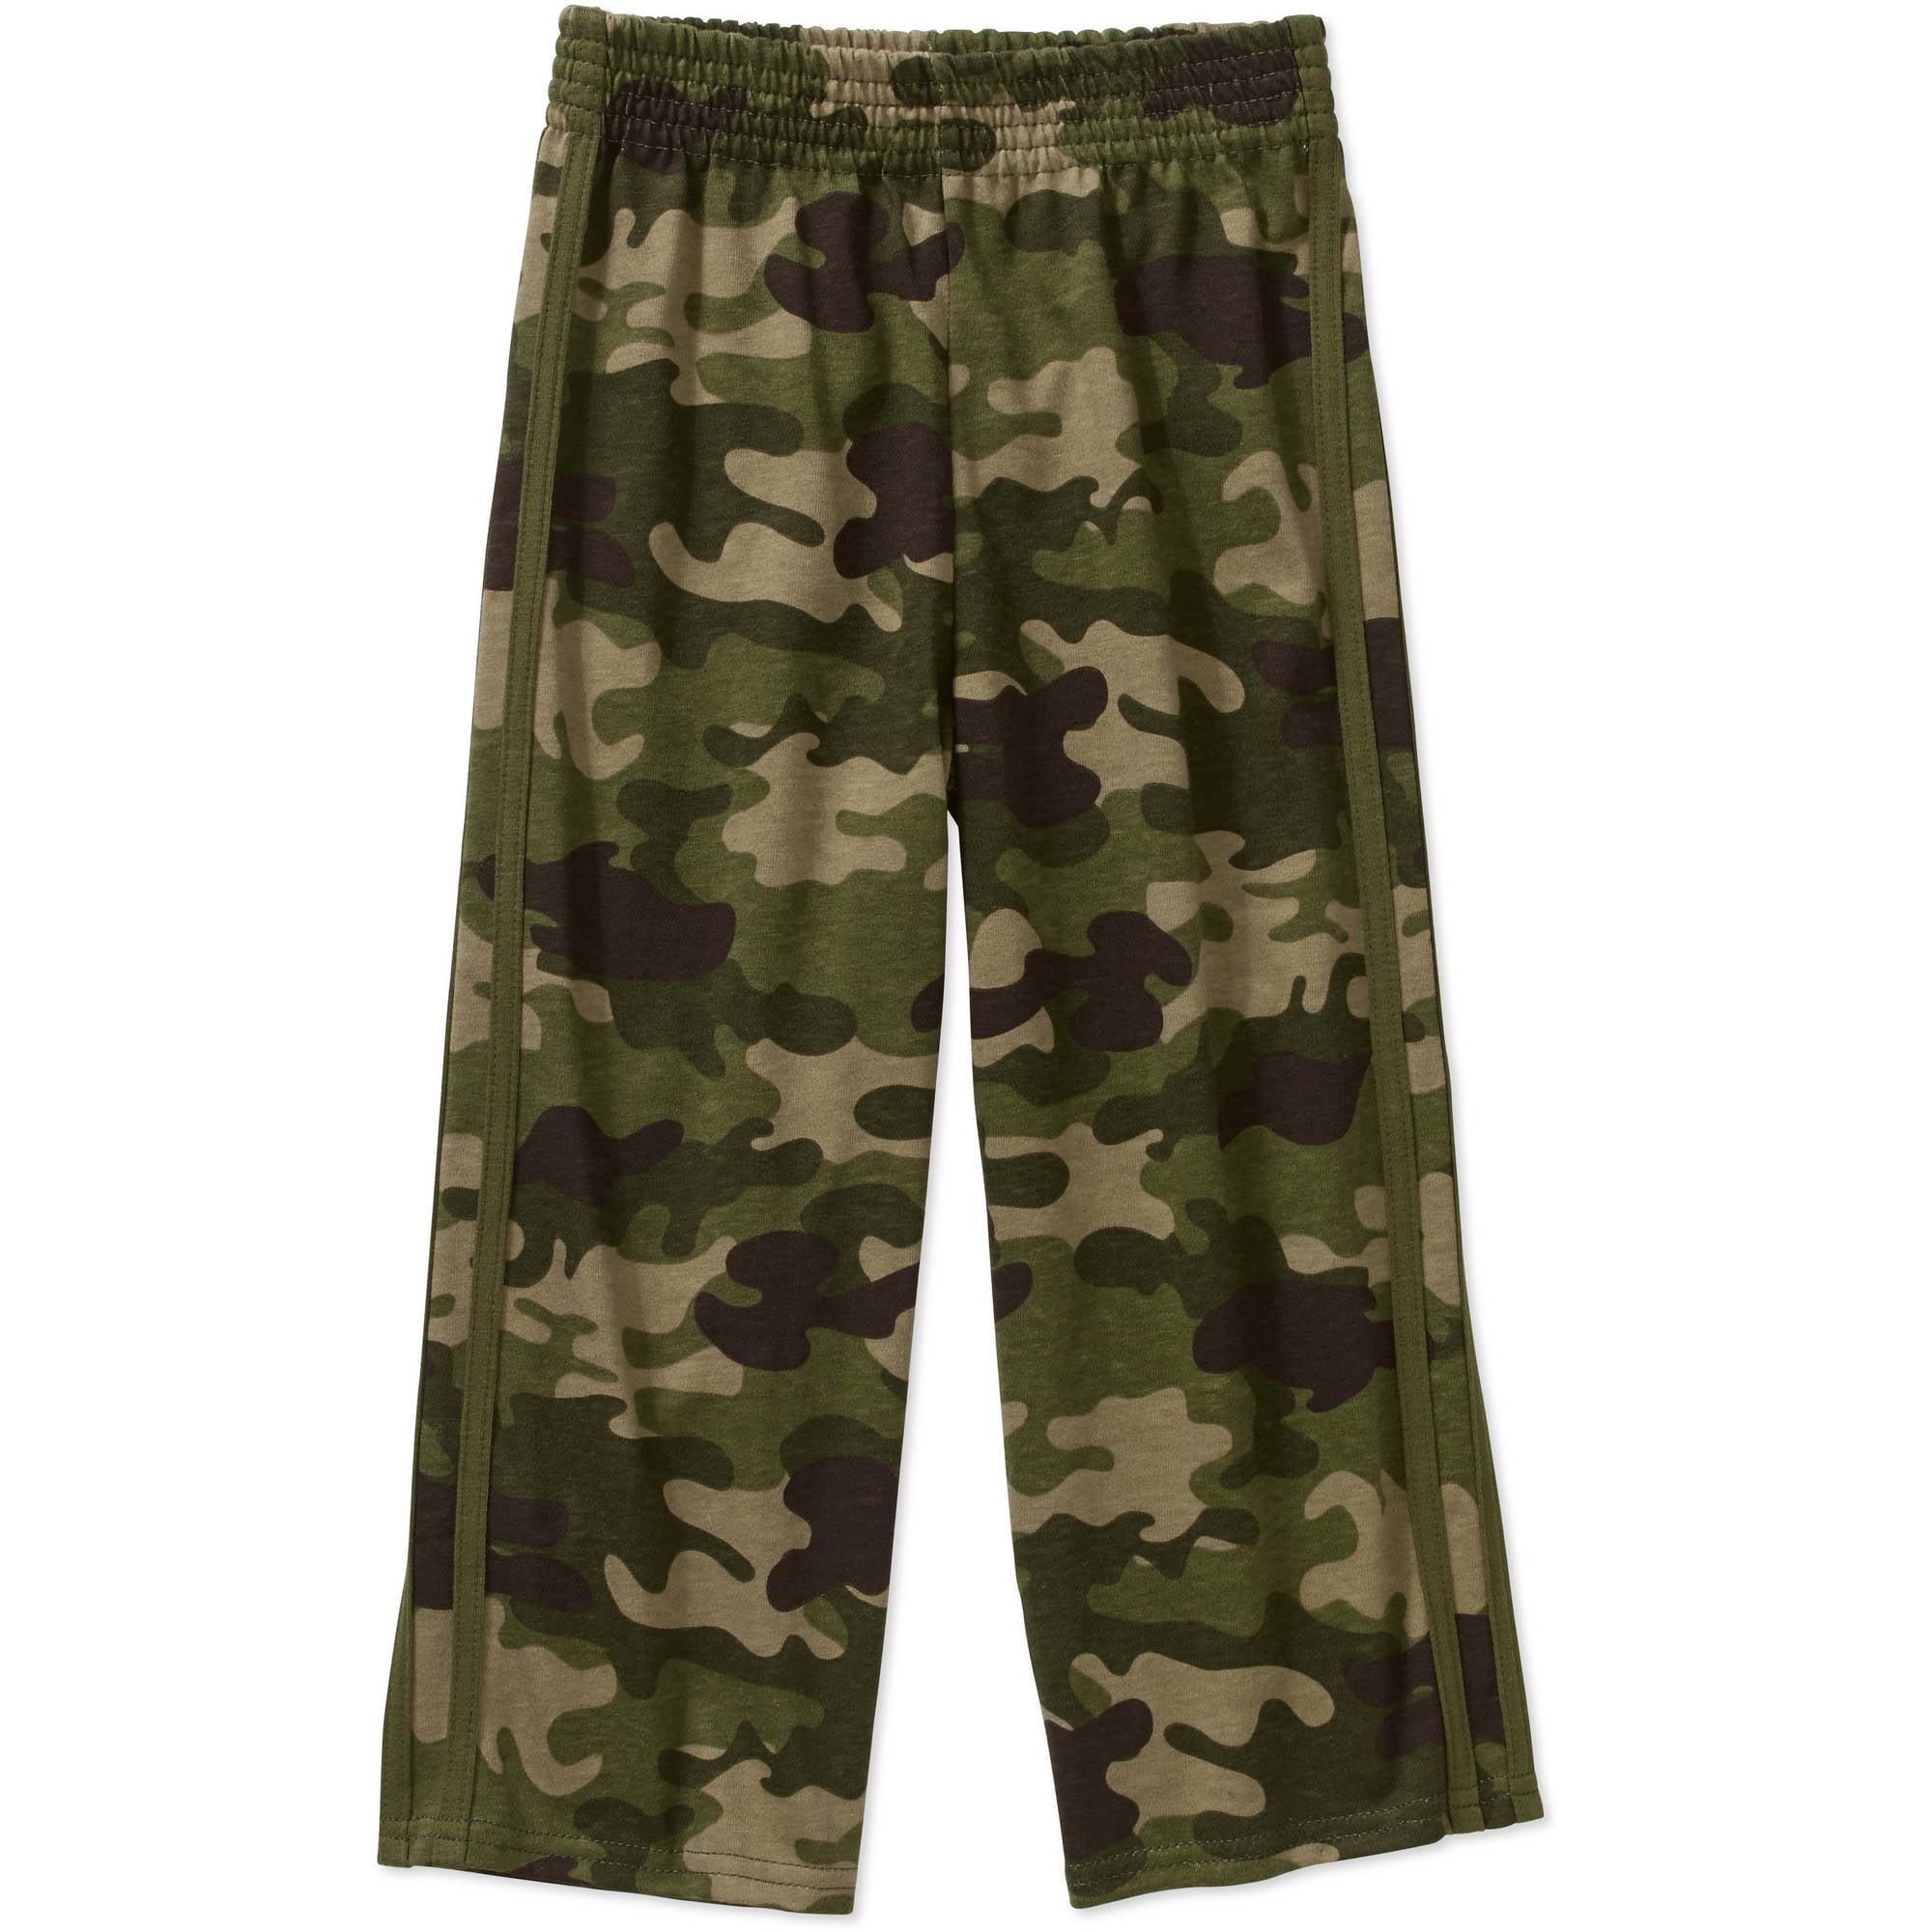 Garanimals Baby Toddler Boy Green Camo Jersey Pants Sweatpants